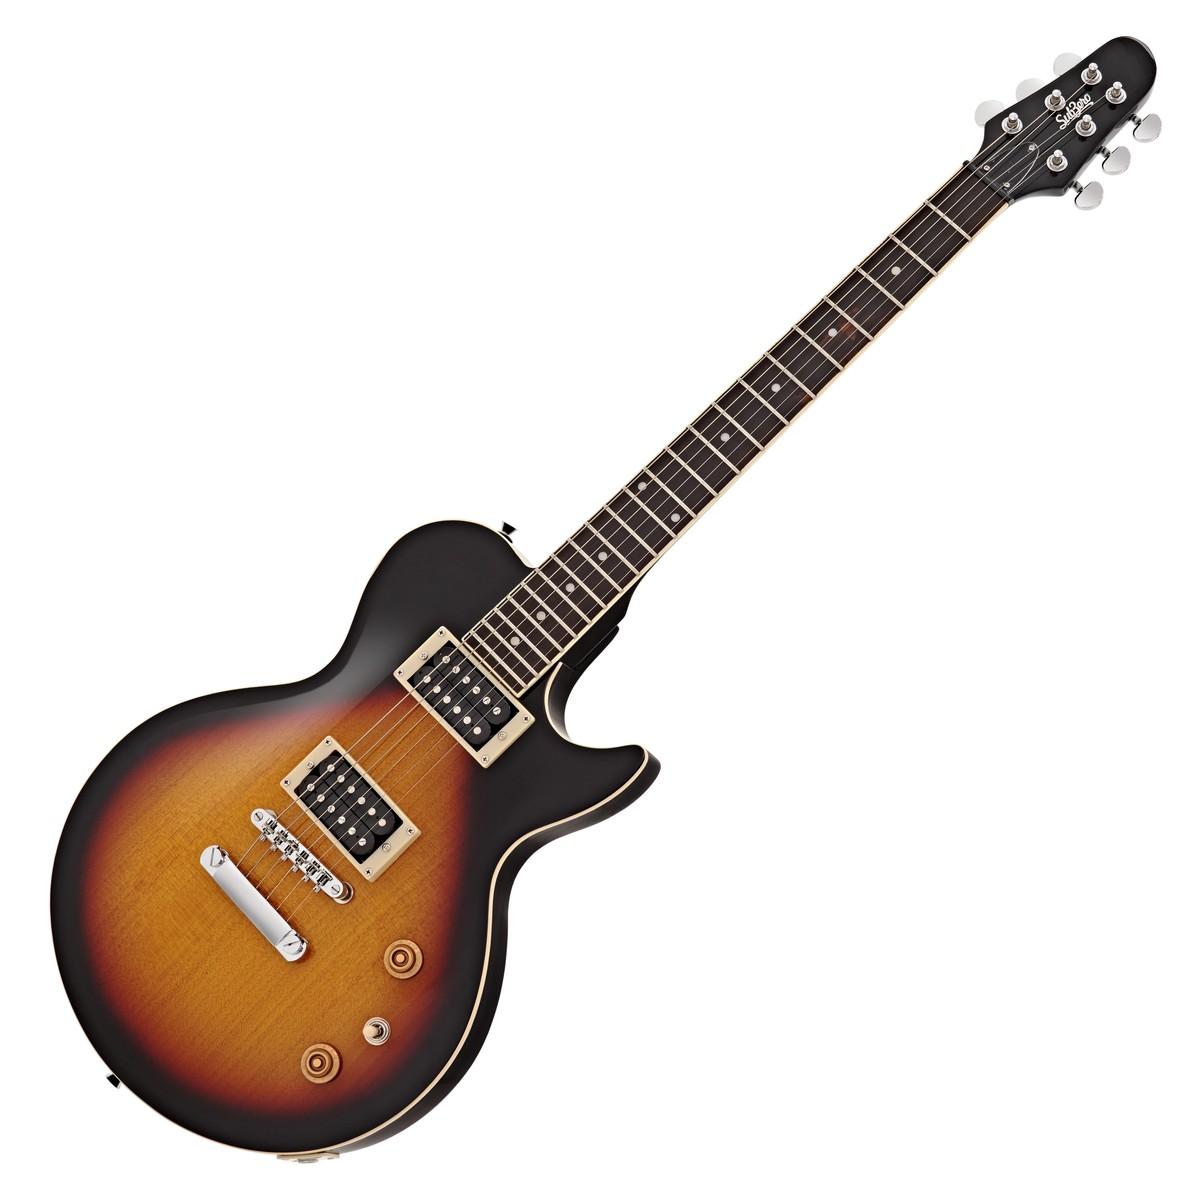 guitare lectrique subzero new jersey iii vintage sunburst. Black Bedroom Furniture Sets. Home Design Ideas